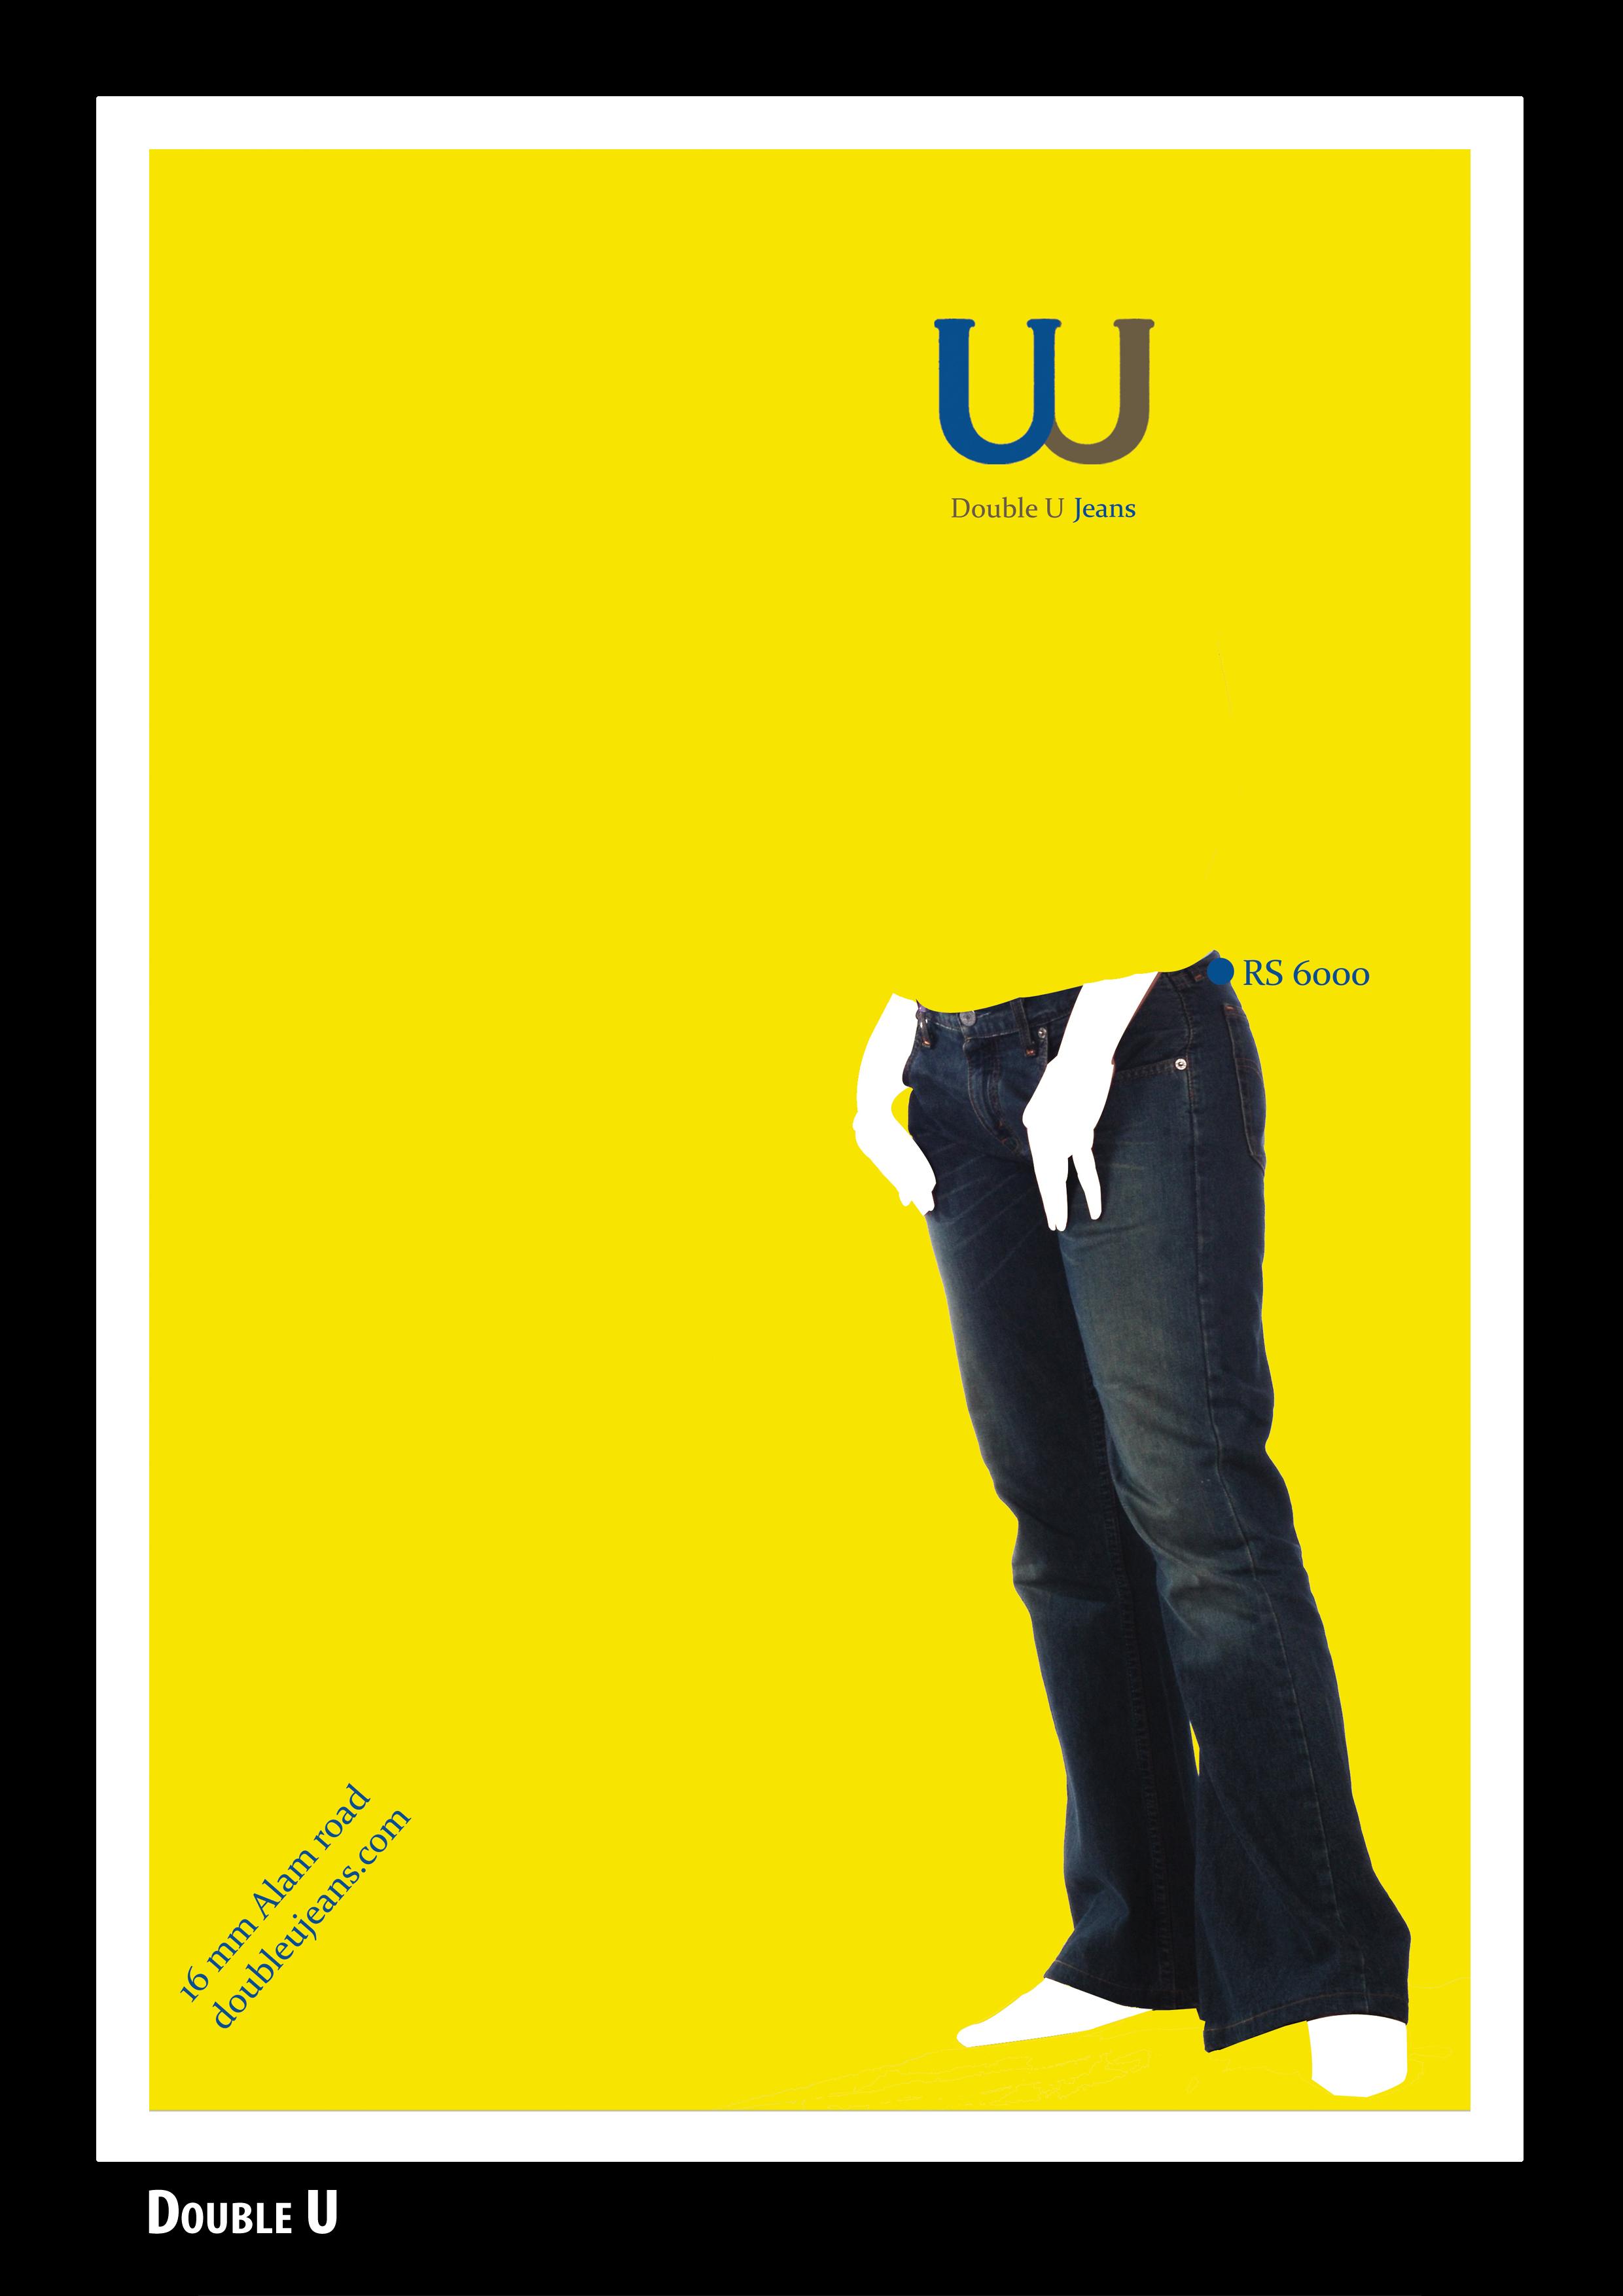 Poster design jeans - Double U Jeans Magazine Print 3